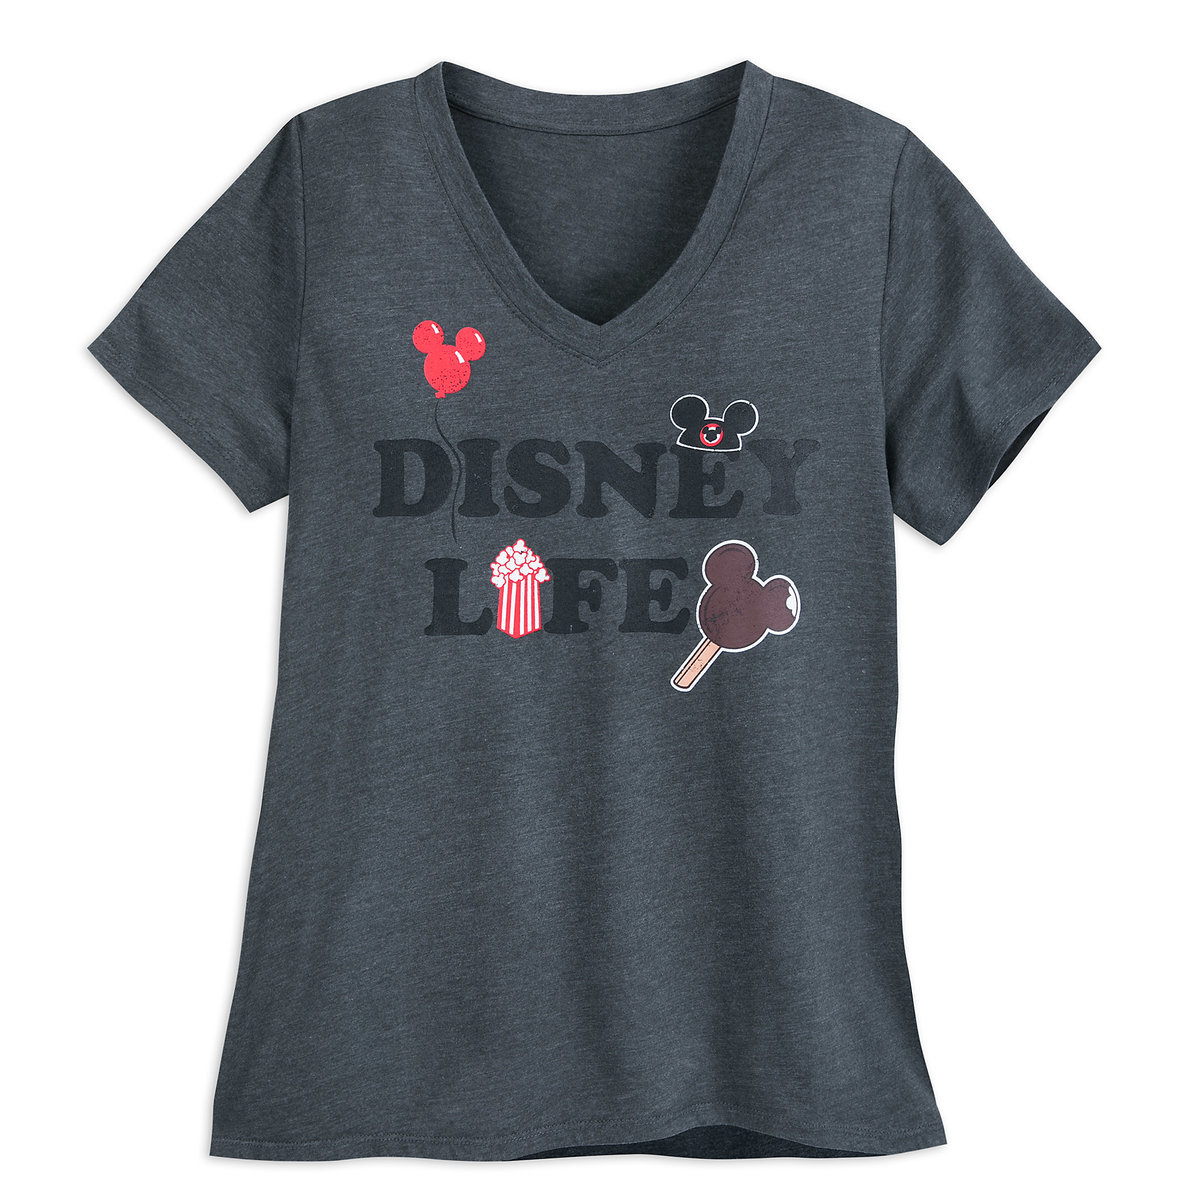 389eb83ac55628 Product Image of Disney Parks Souvenir Fashion T-Shirt for Women   1